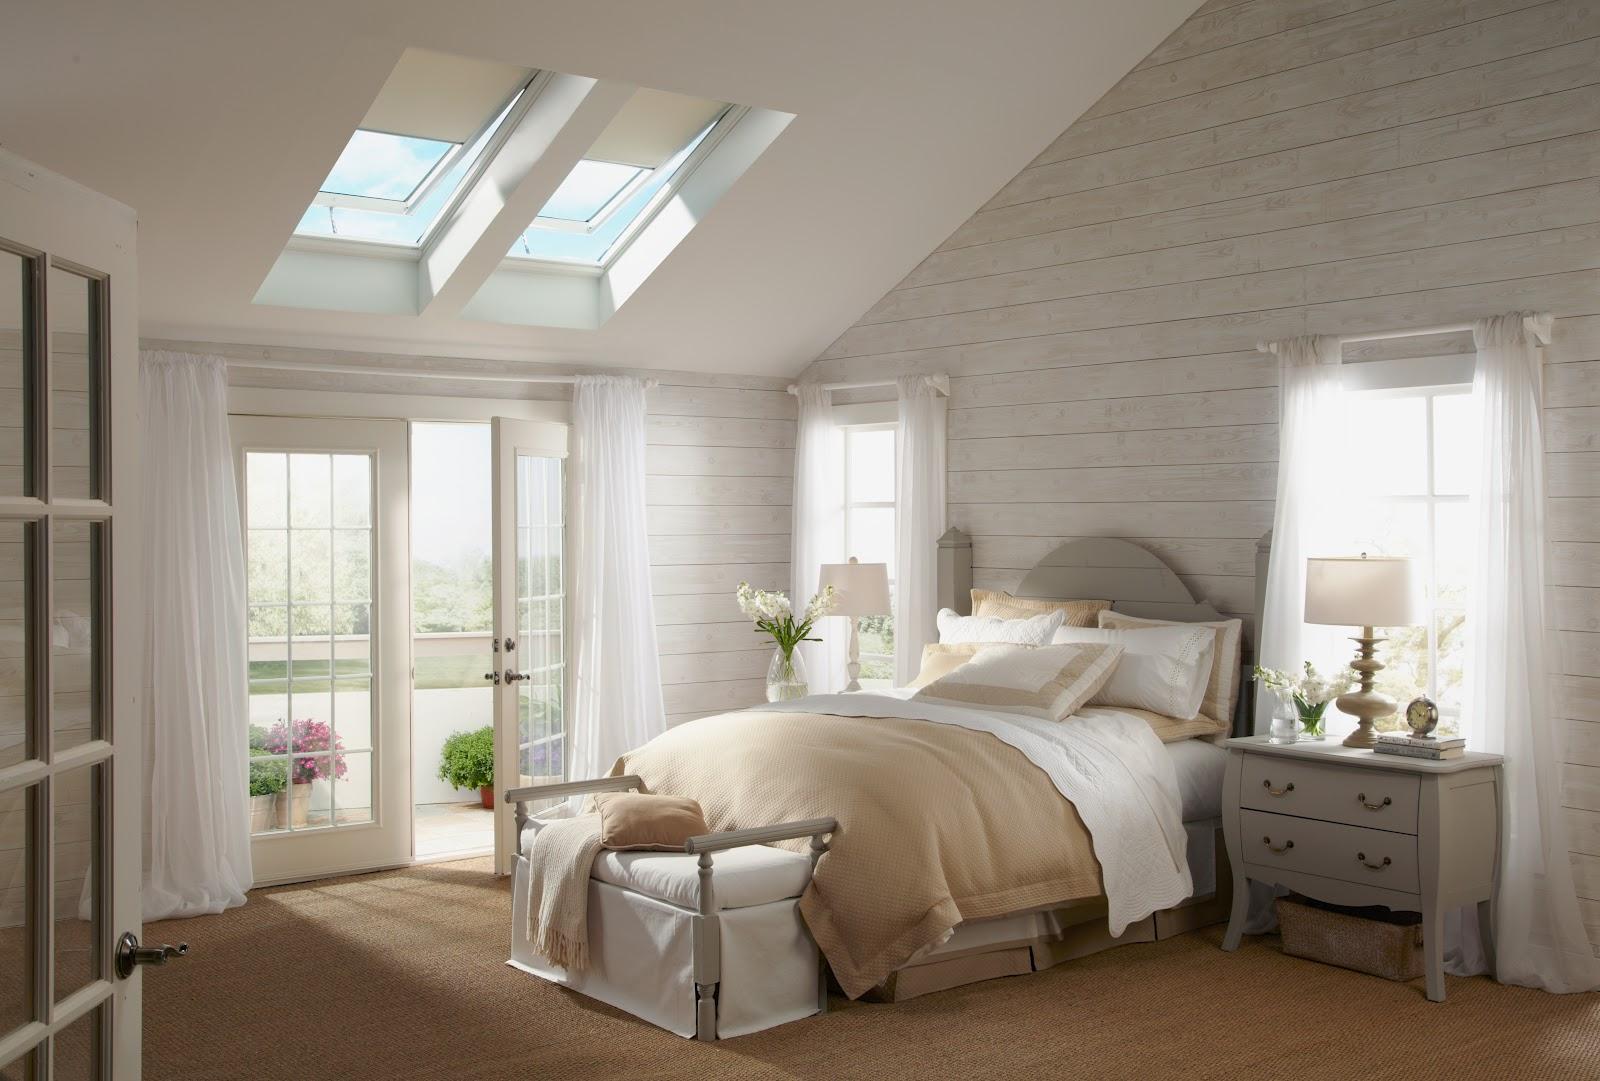 home becomes her: 5 ways - look slimmer & make a room look bigger